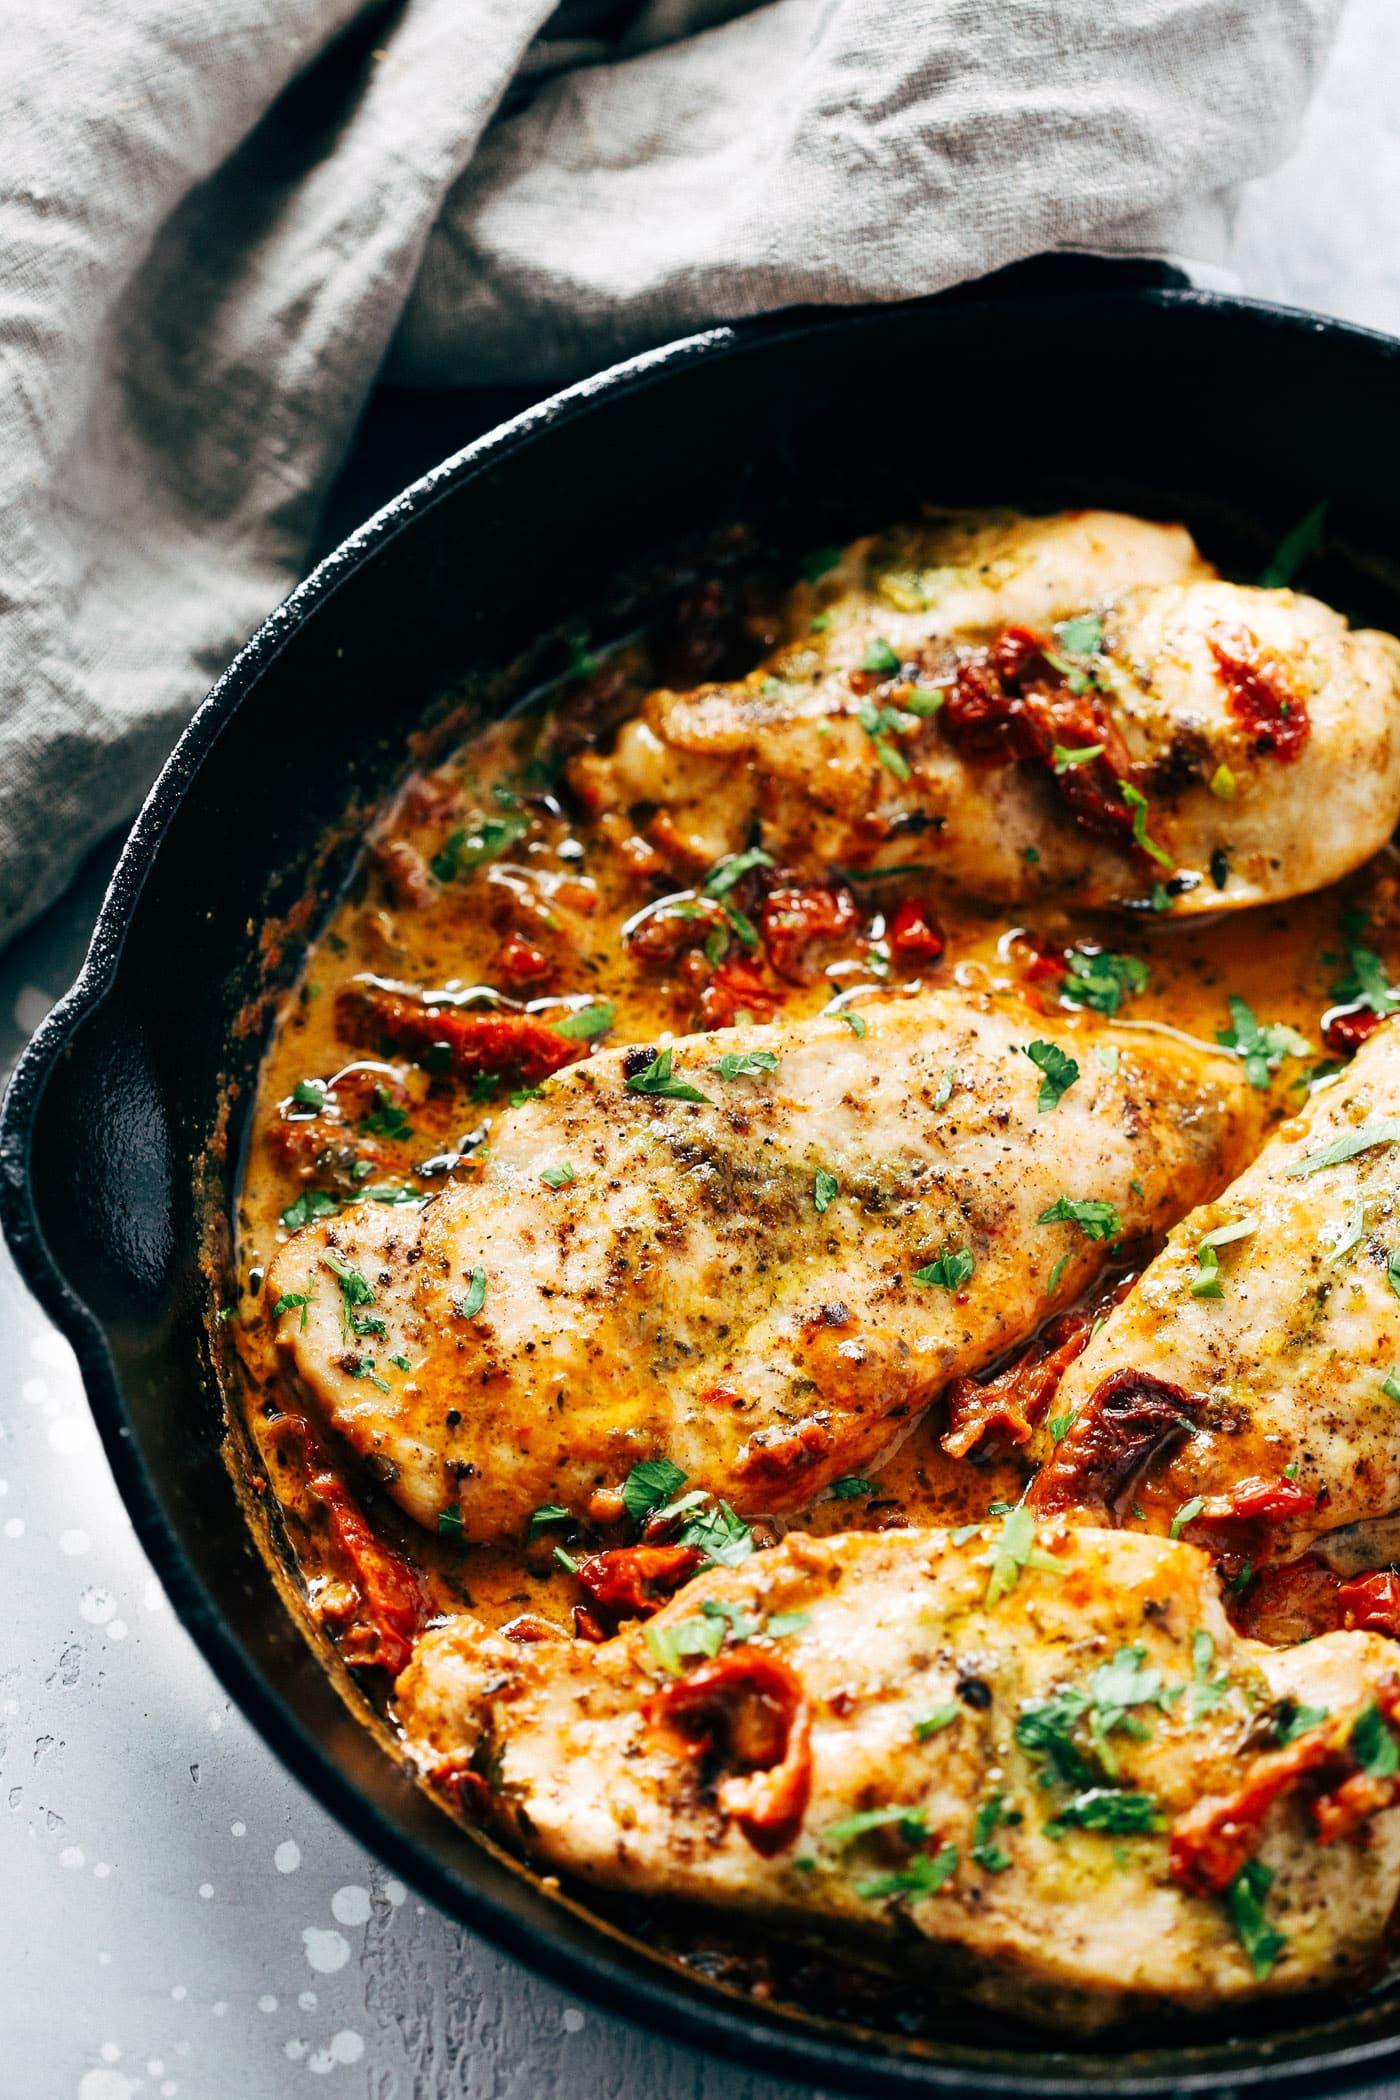 Clever Italian Ken Recipes Quick Easy Ken Dishes Italian Ken Dishes Dinner Italian Ken Dishes Names nice food Italian Chicken Dishes